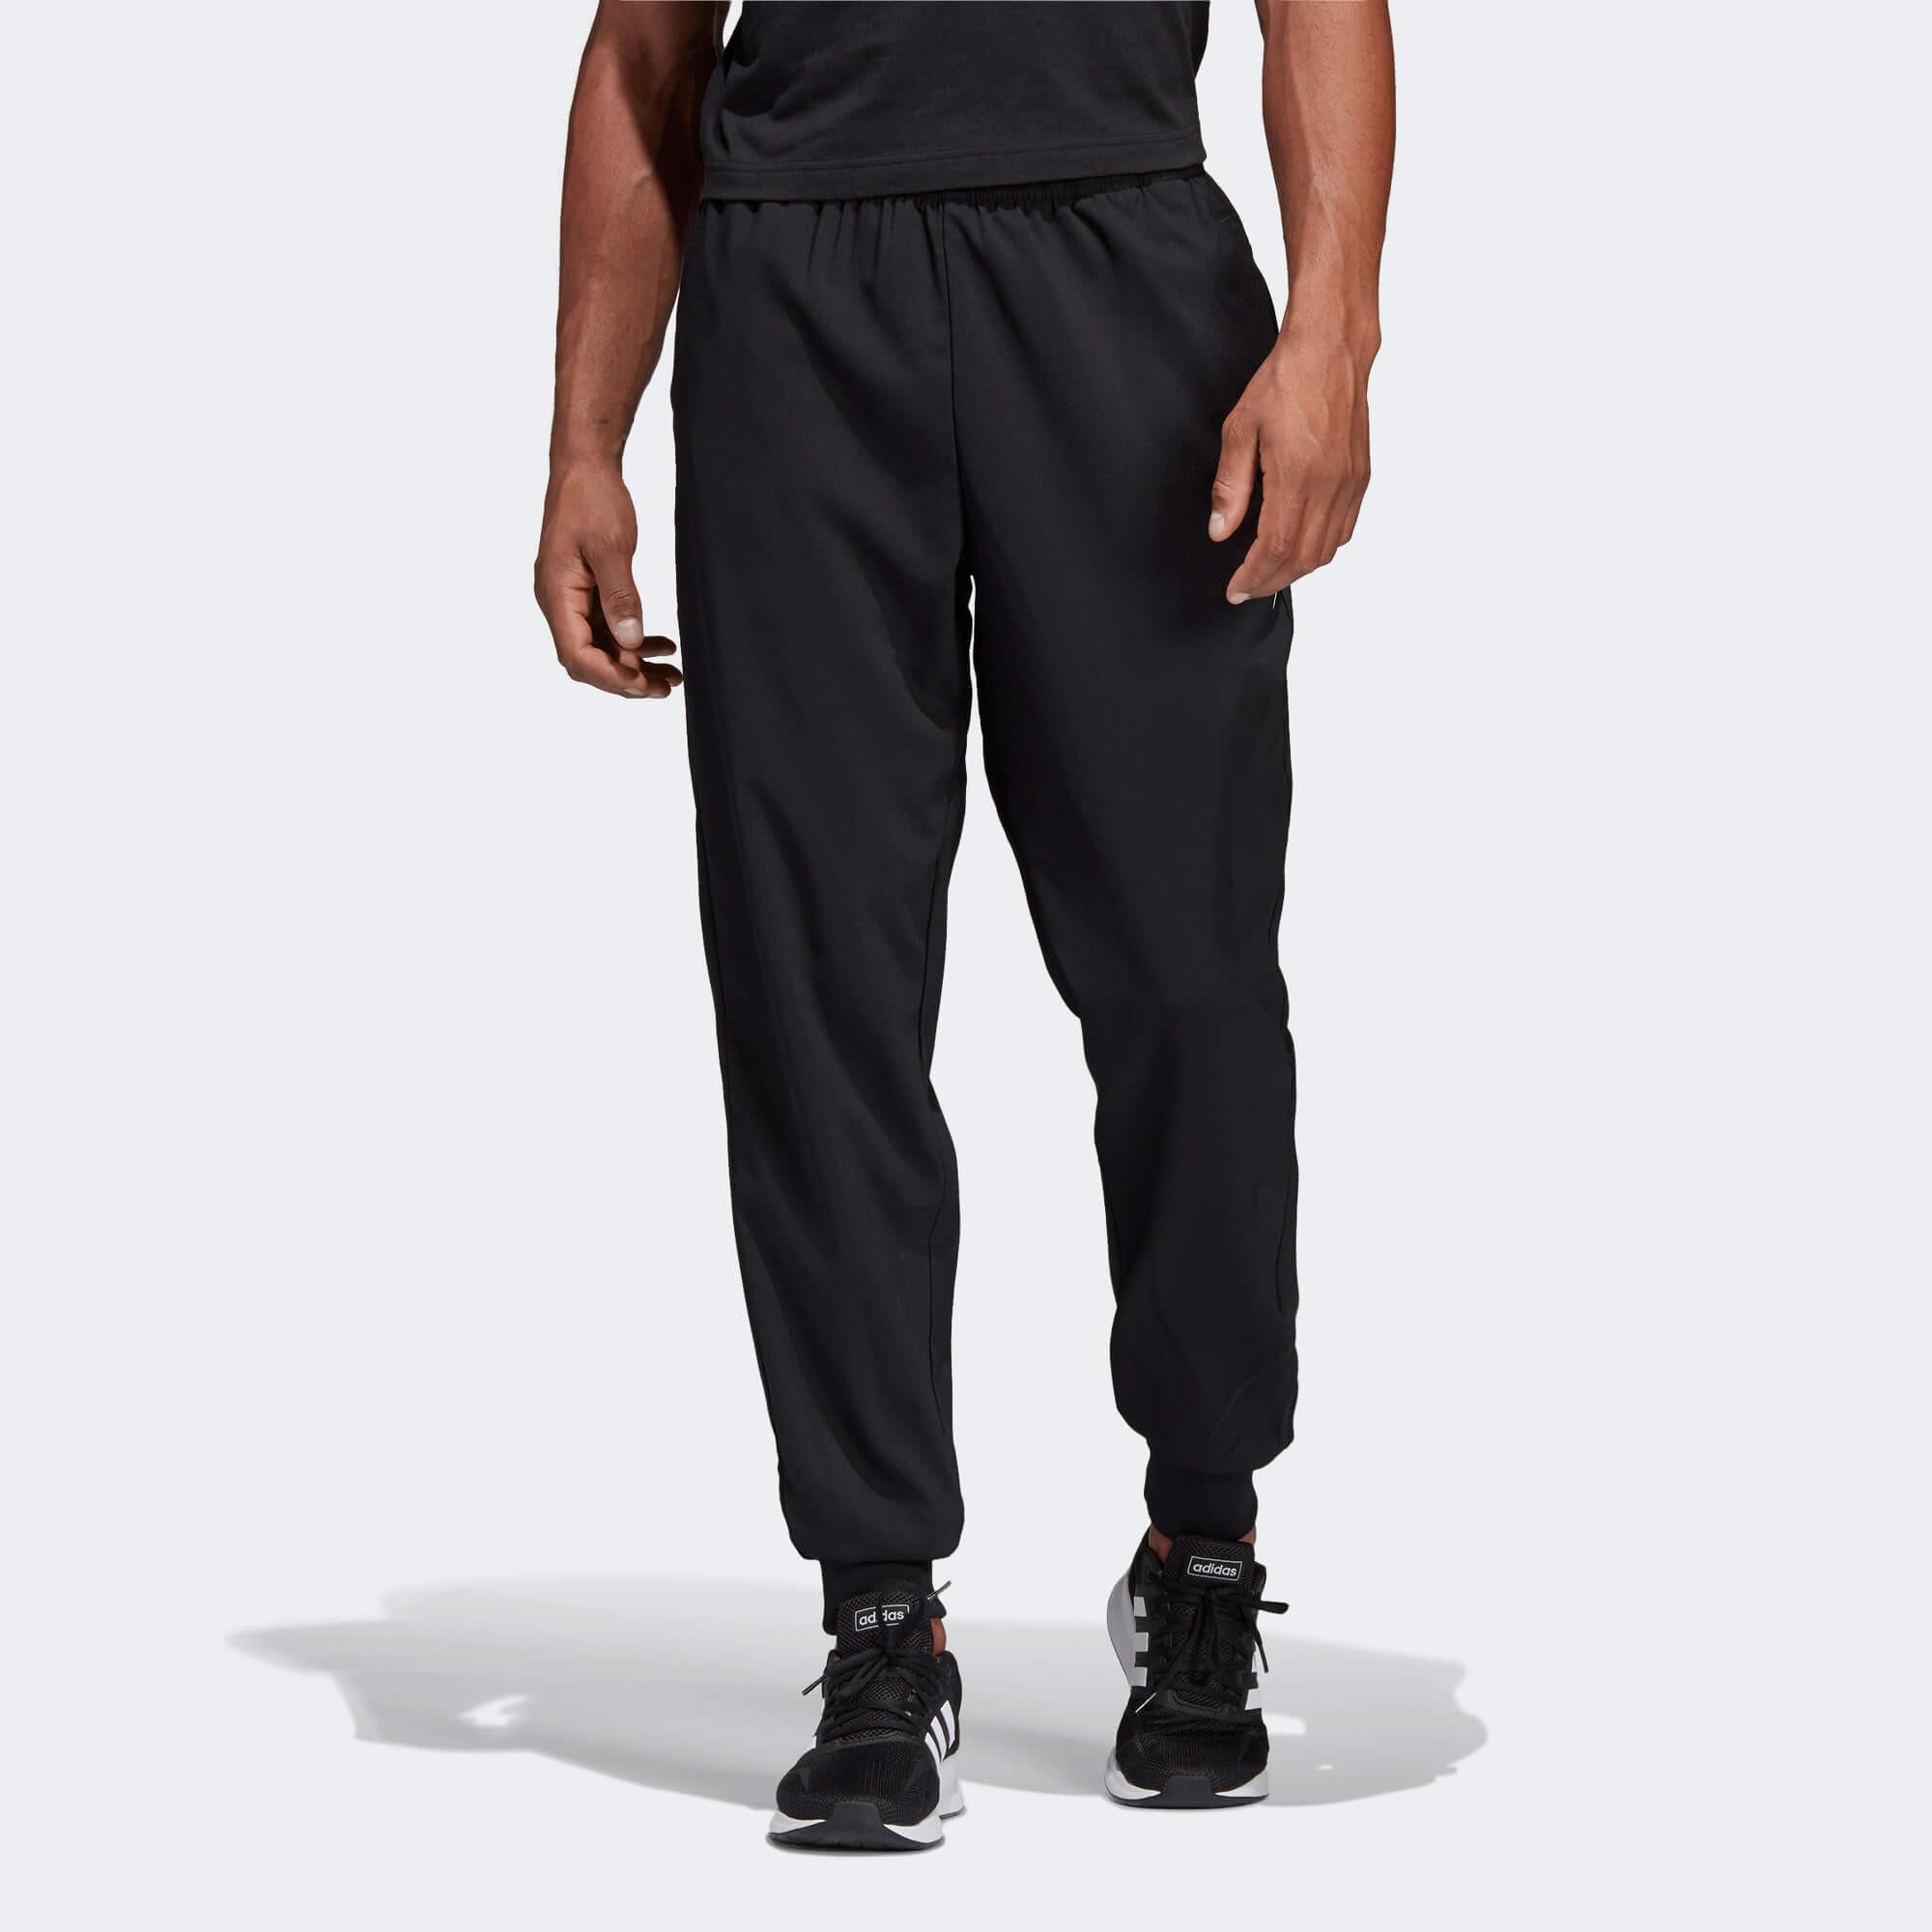 c1f597a0 E PLN T STANFRD Spodnie męskie